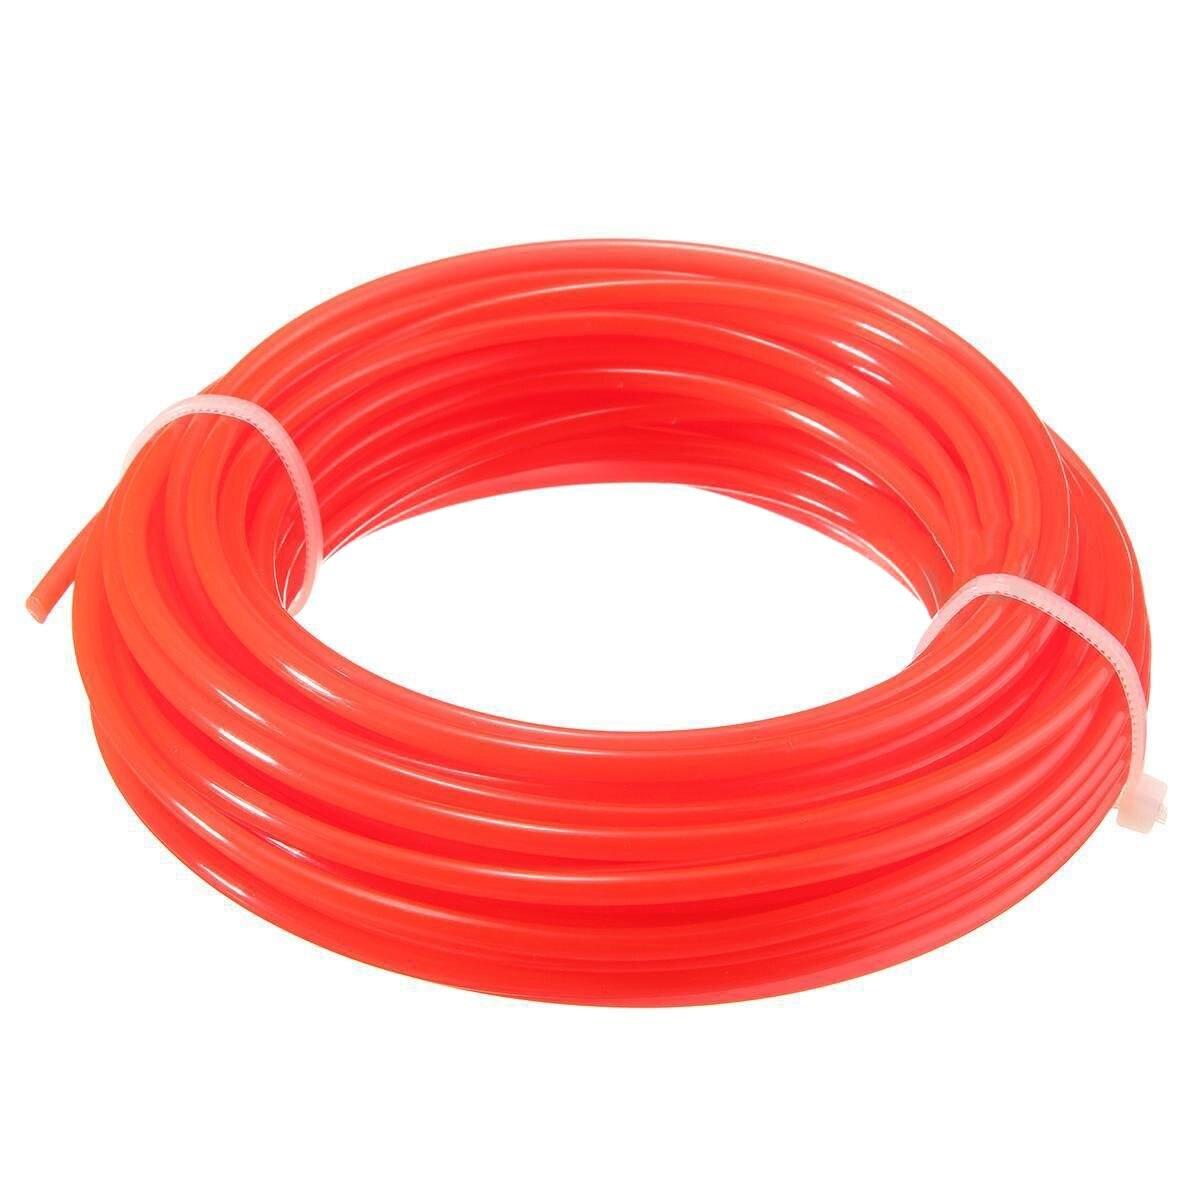 15m x 2.0mm New Trim Line Strimmer Nylon Spool Refill Cord Wire Trimmer